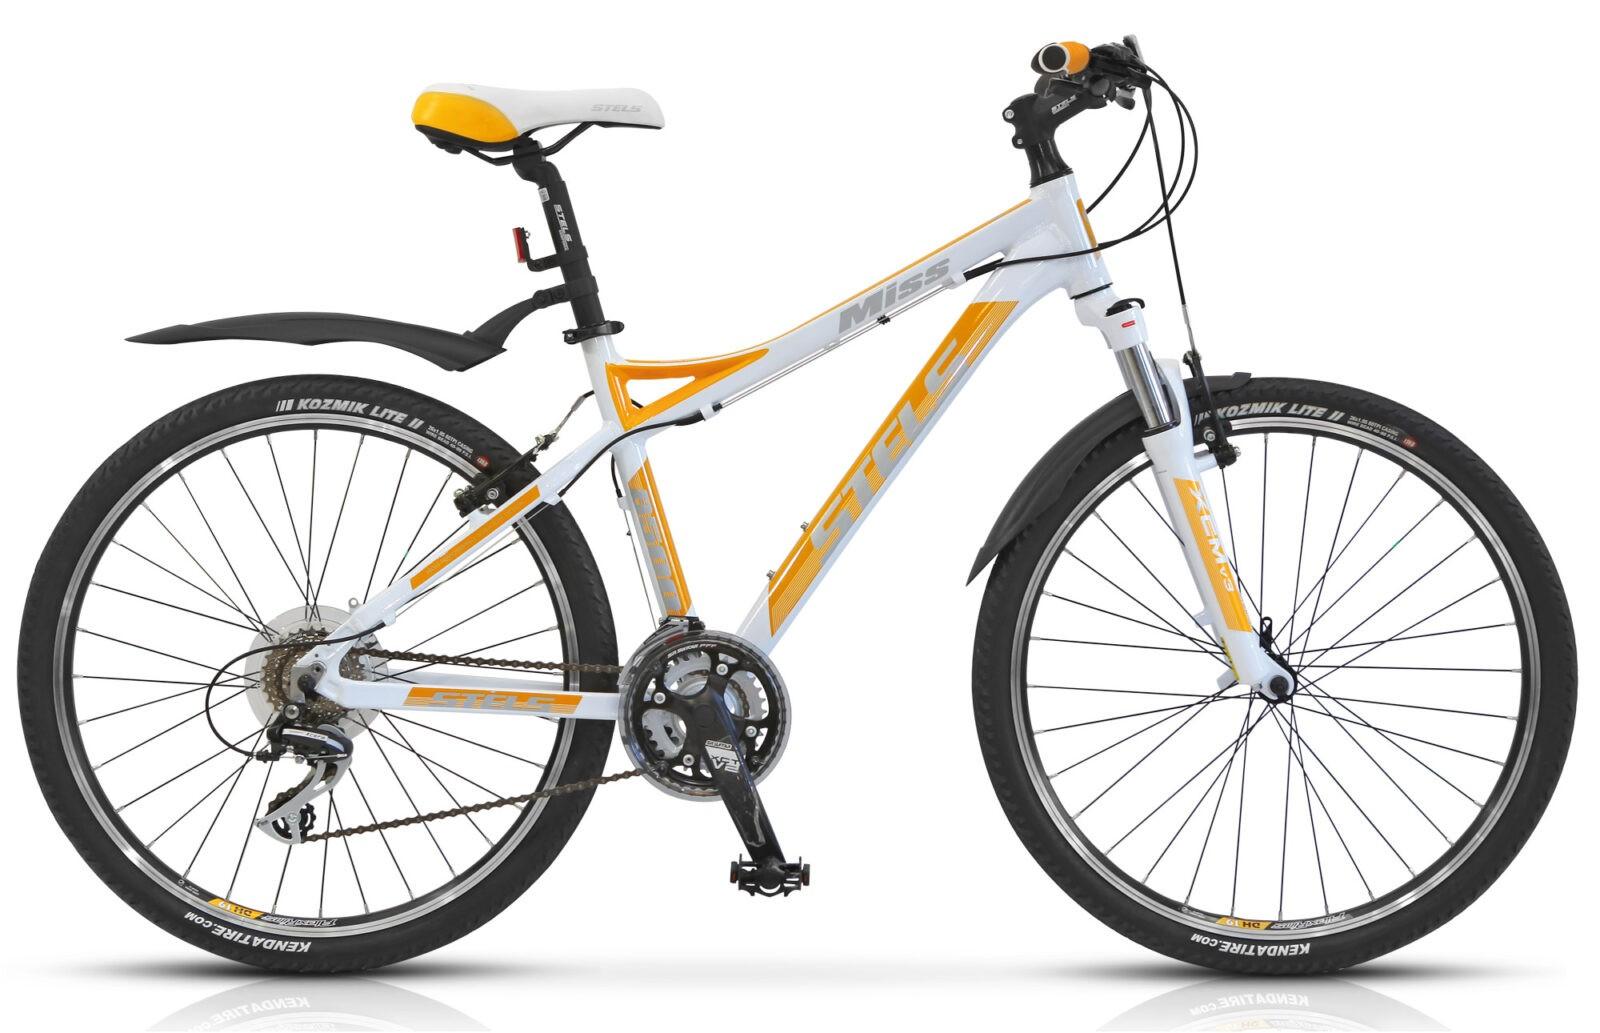 Картинки велосипеда стелс